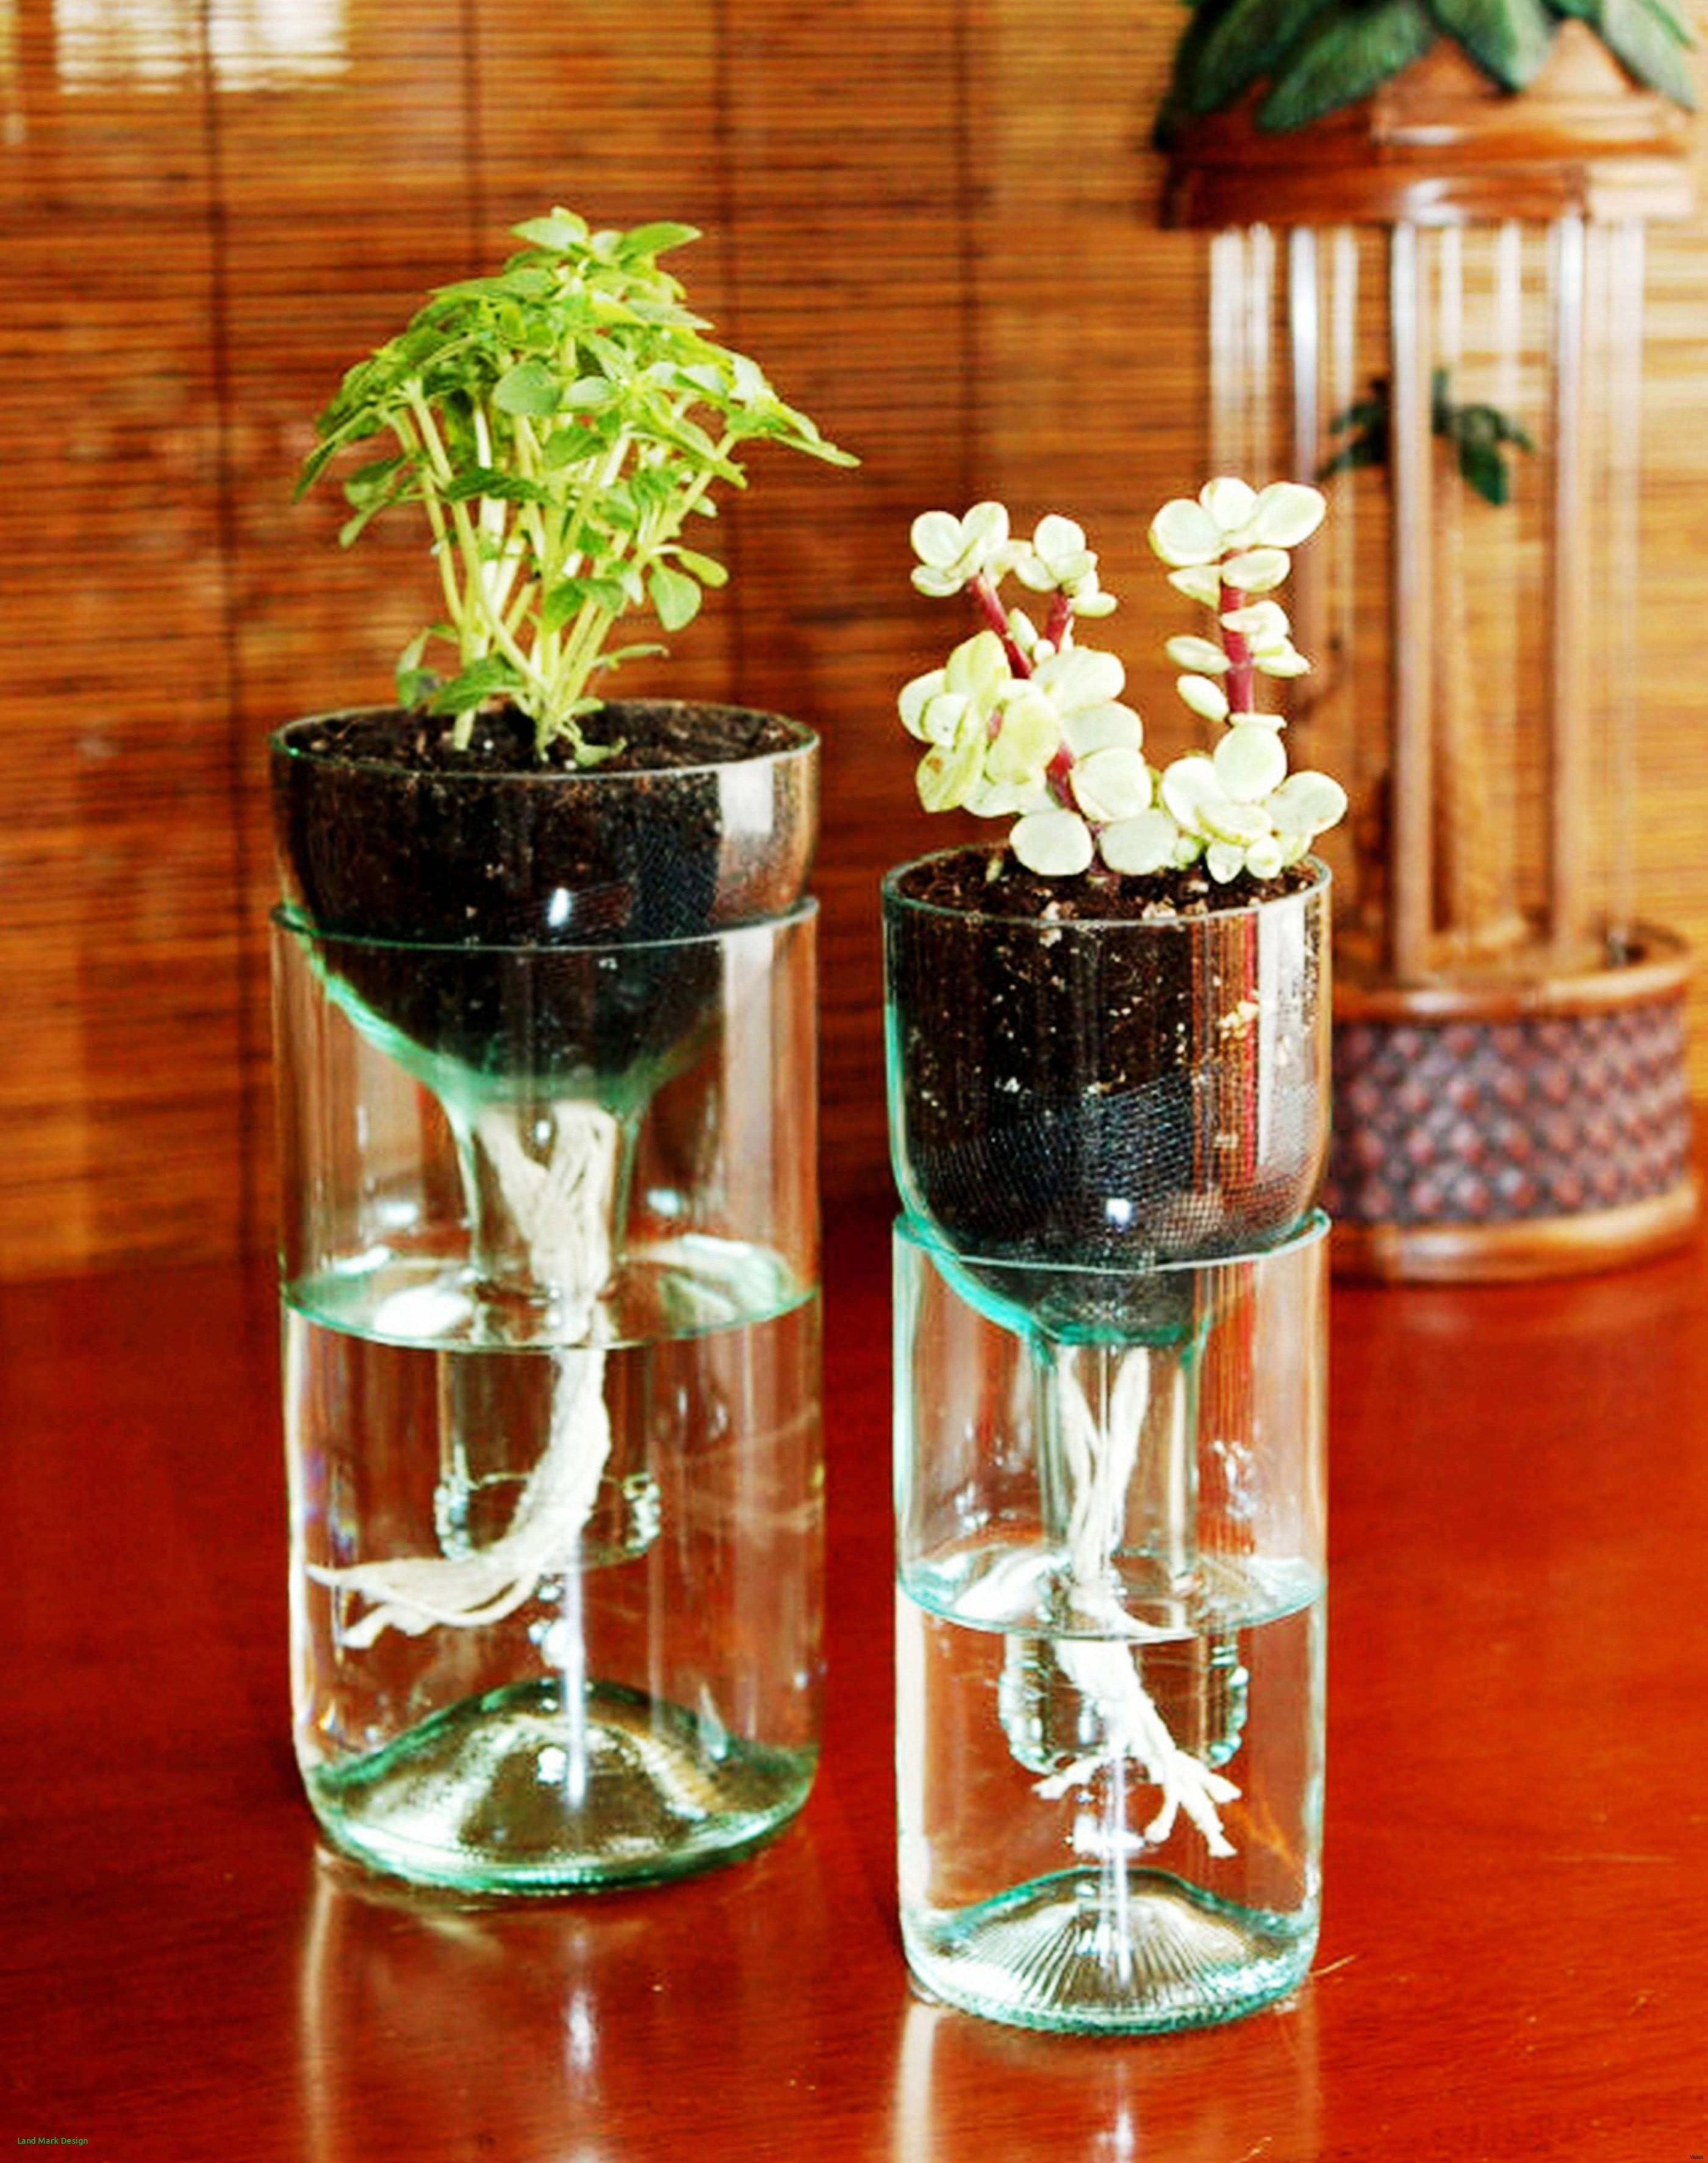 rose vase ideas of 10 flower pot ideas favorite for elegant room splusna com page within stunning flower vase decoration home on diy interior ideas with homeh vases homei 0d